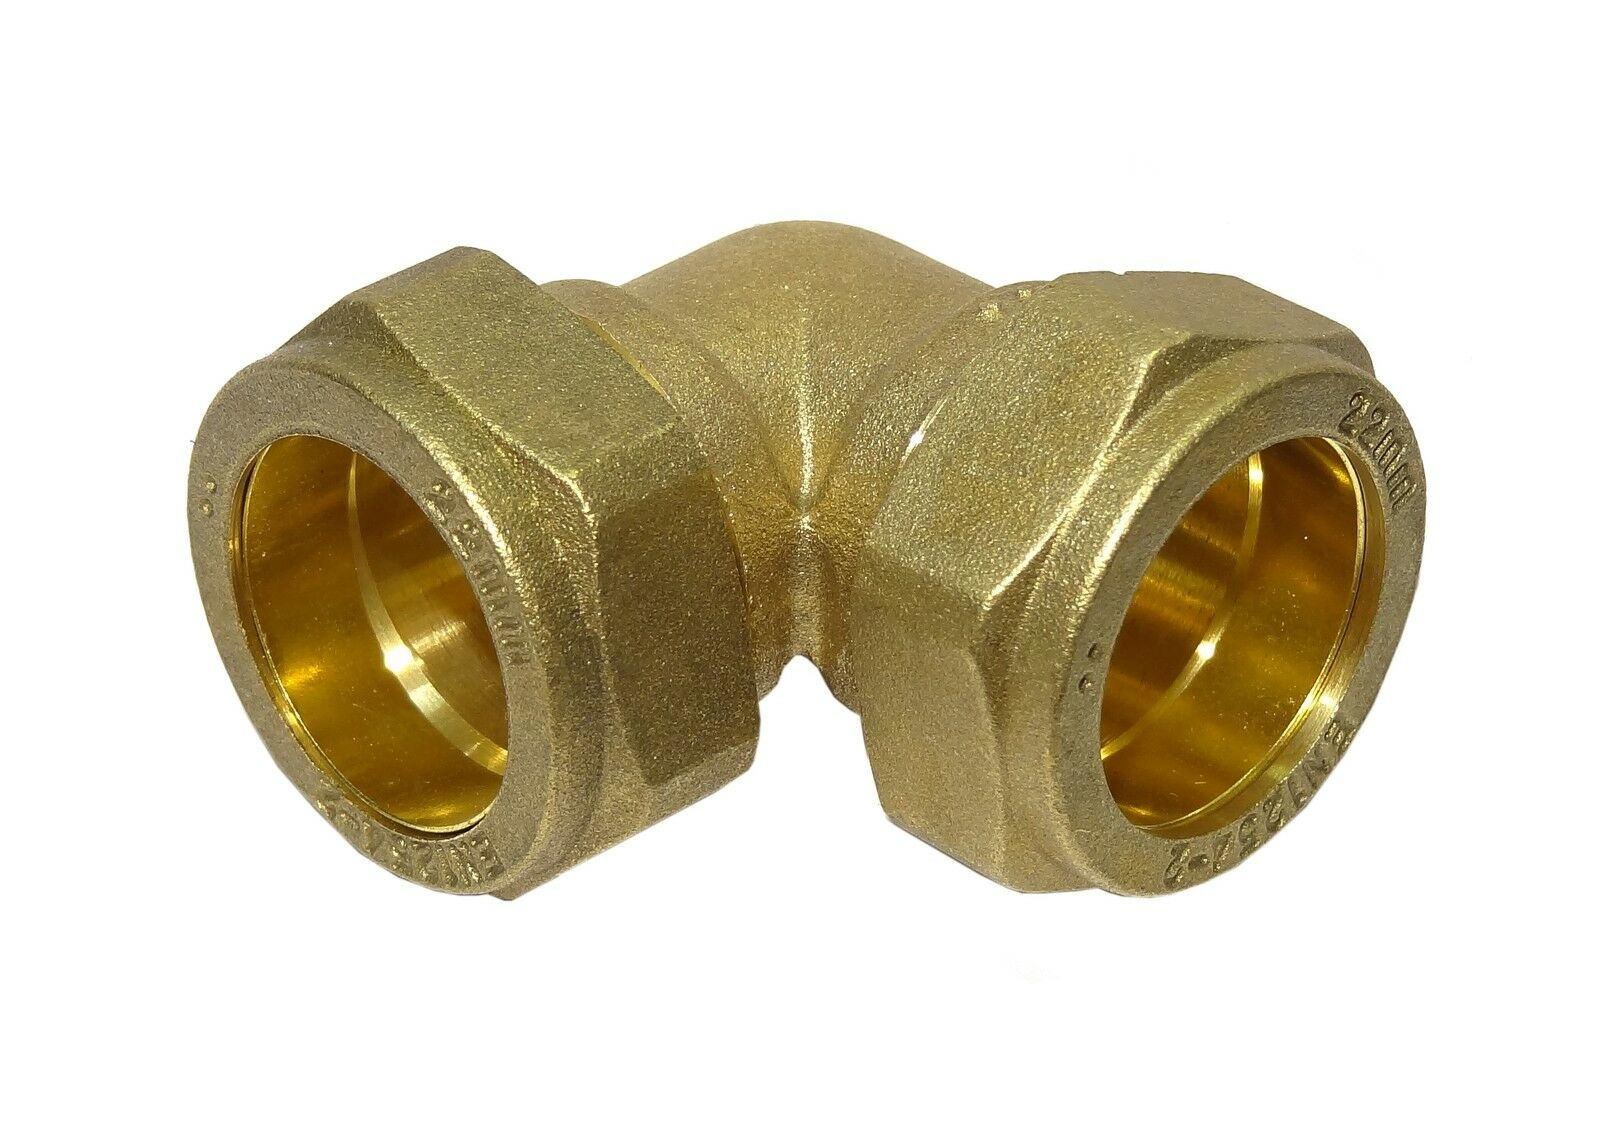 22mm Compression Elbow